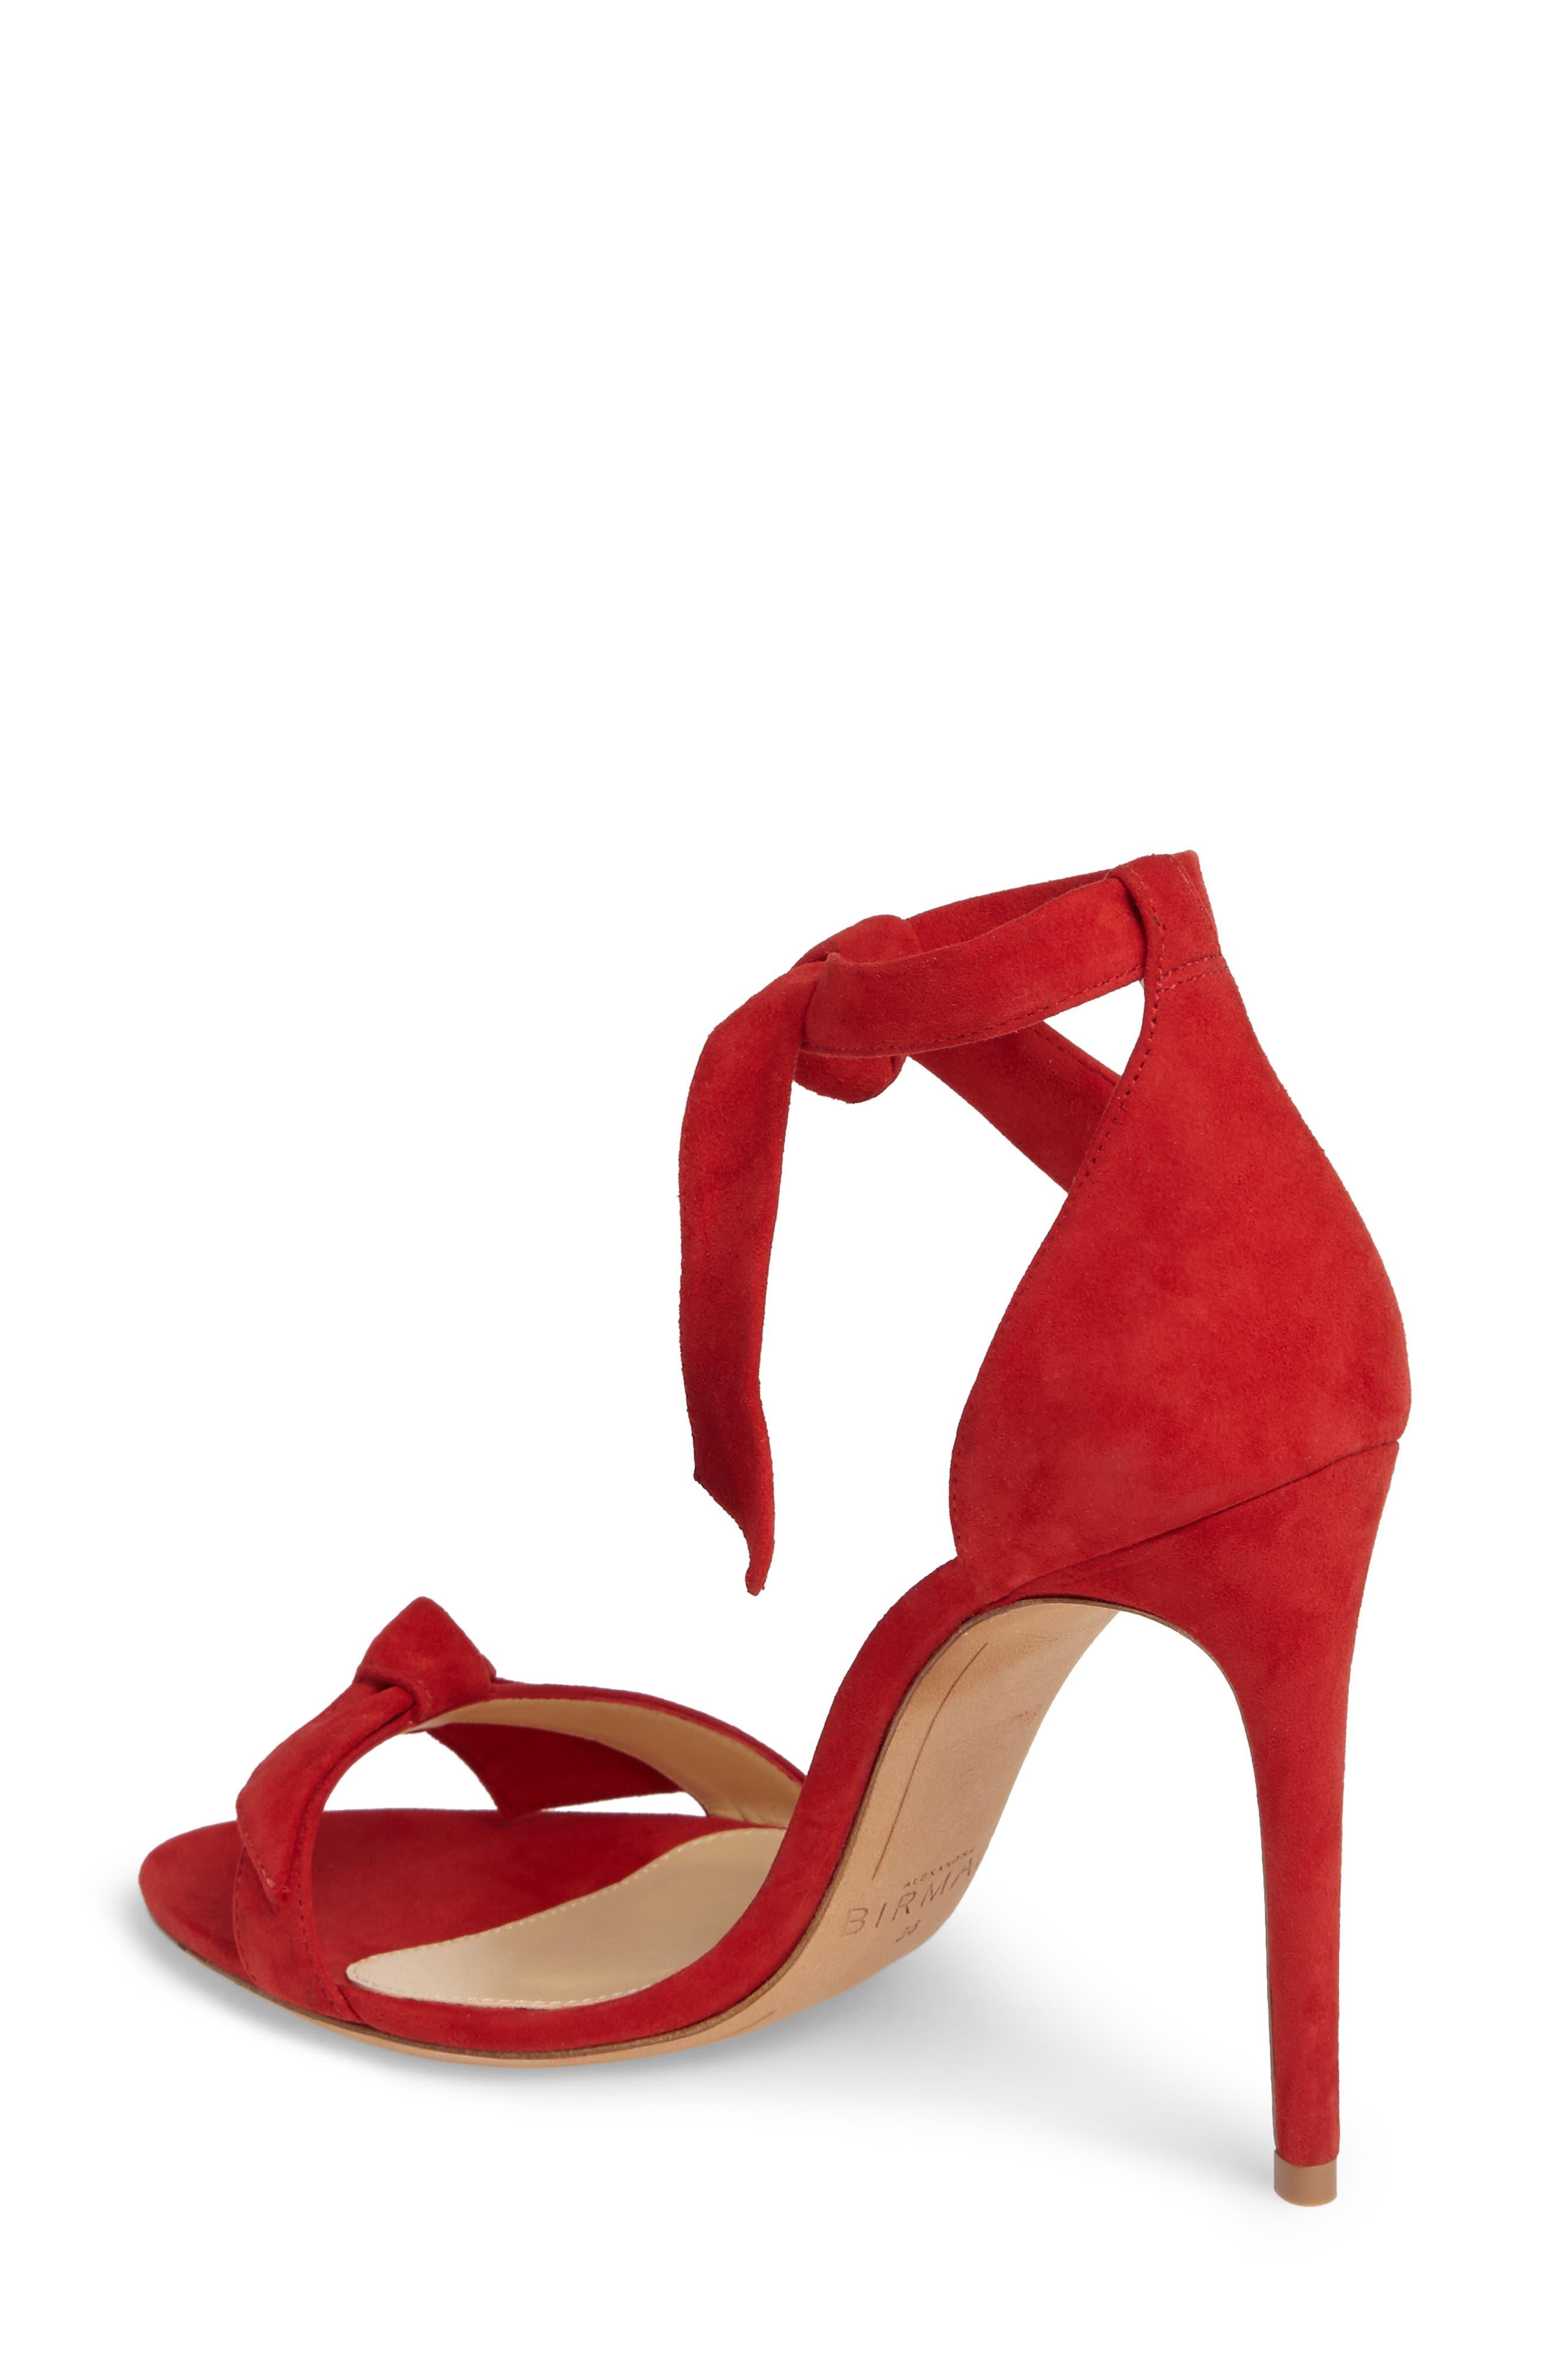 'Clarita' Ankle Tie Sandal,                             Alternate thumbnail 2, color,                             FLAME SUEDE